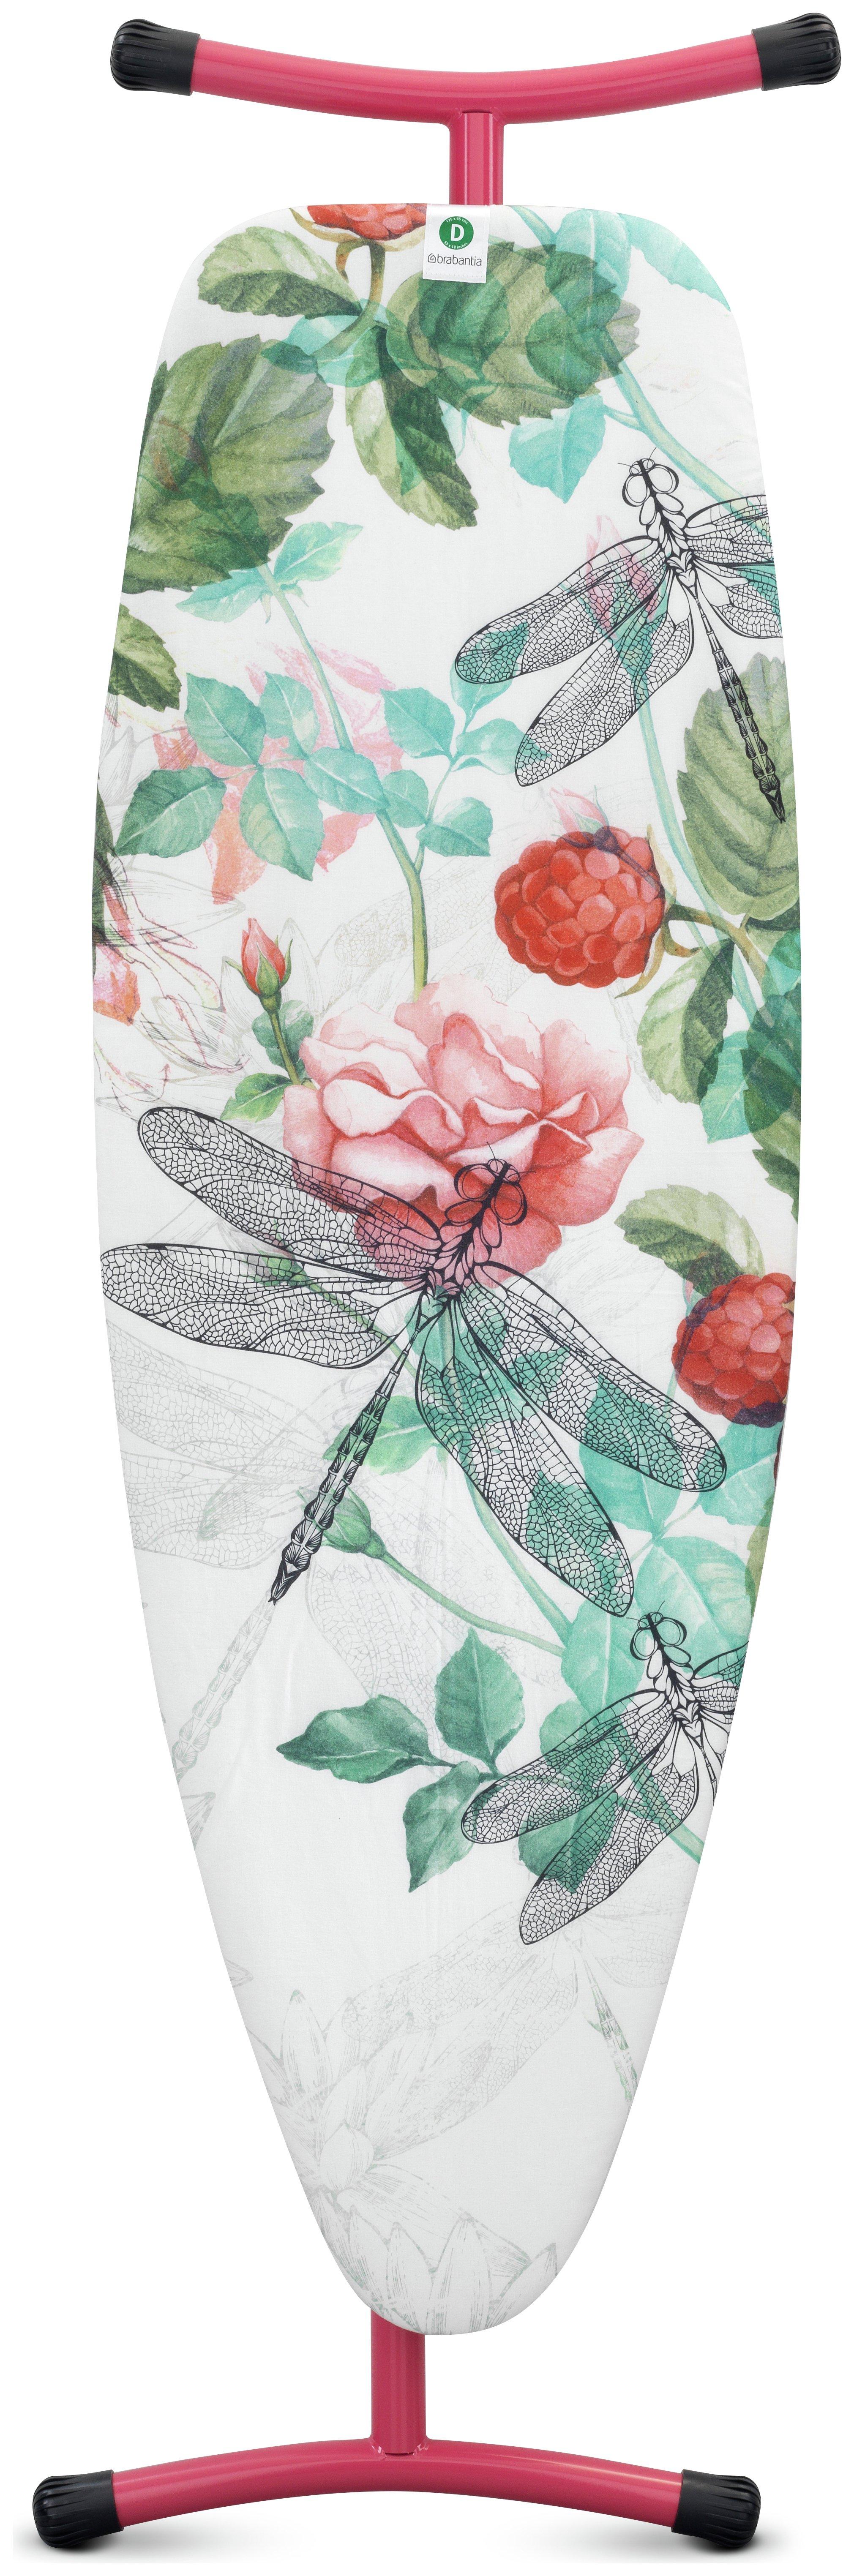 Image of Brabantia 135 x 45cm Folding Ironing Board - Raspberry